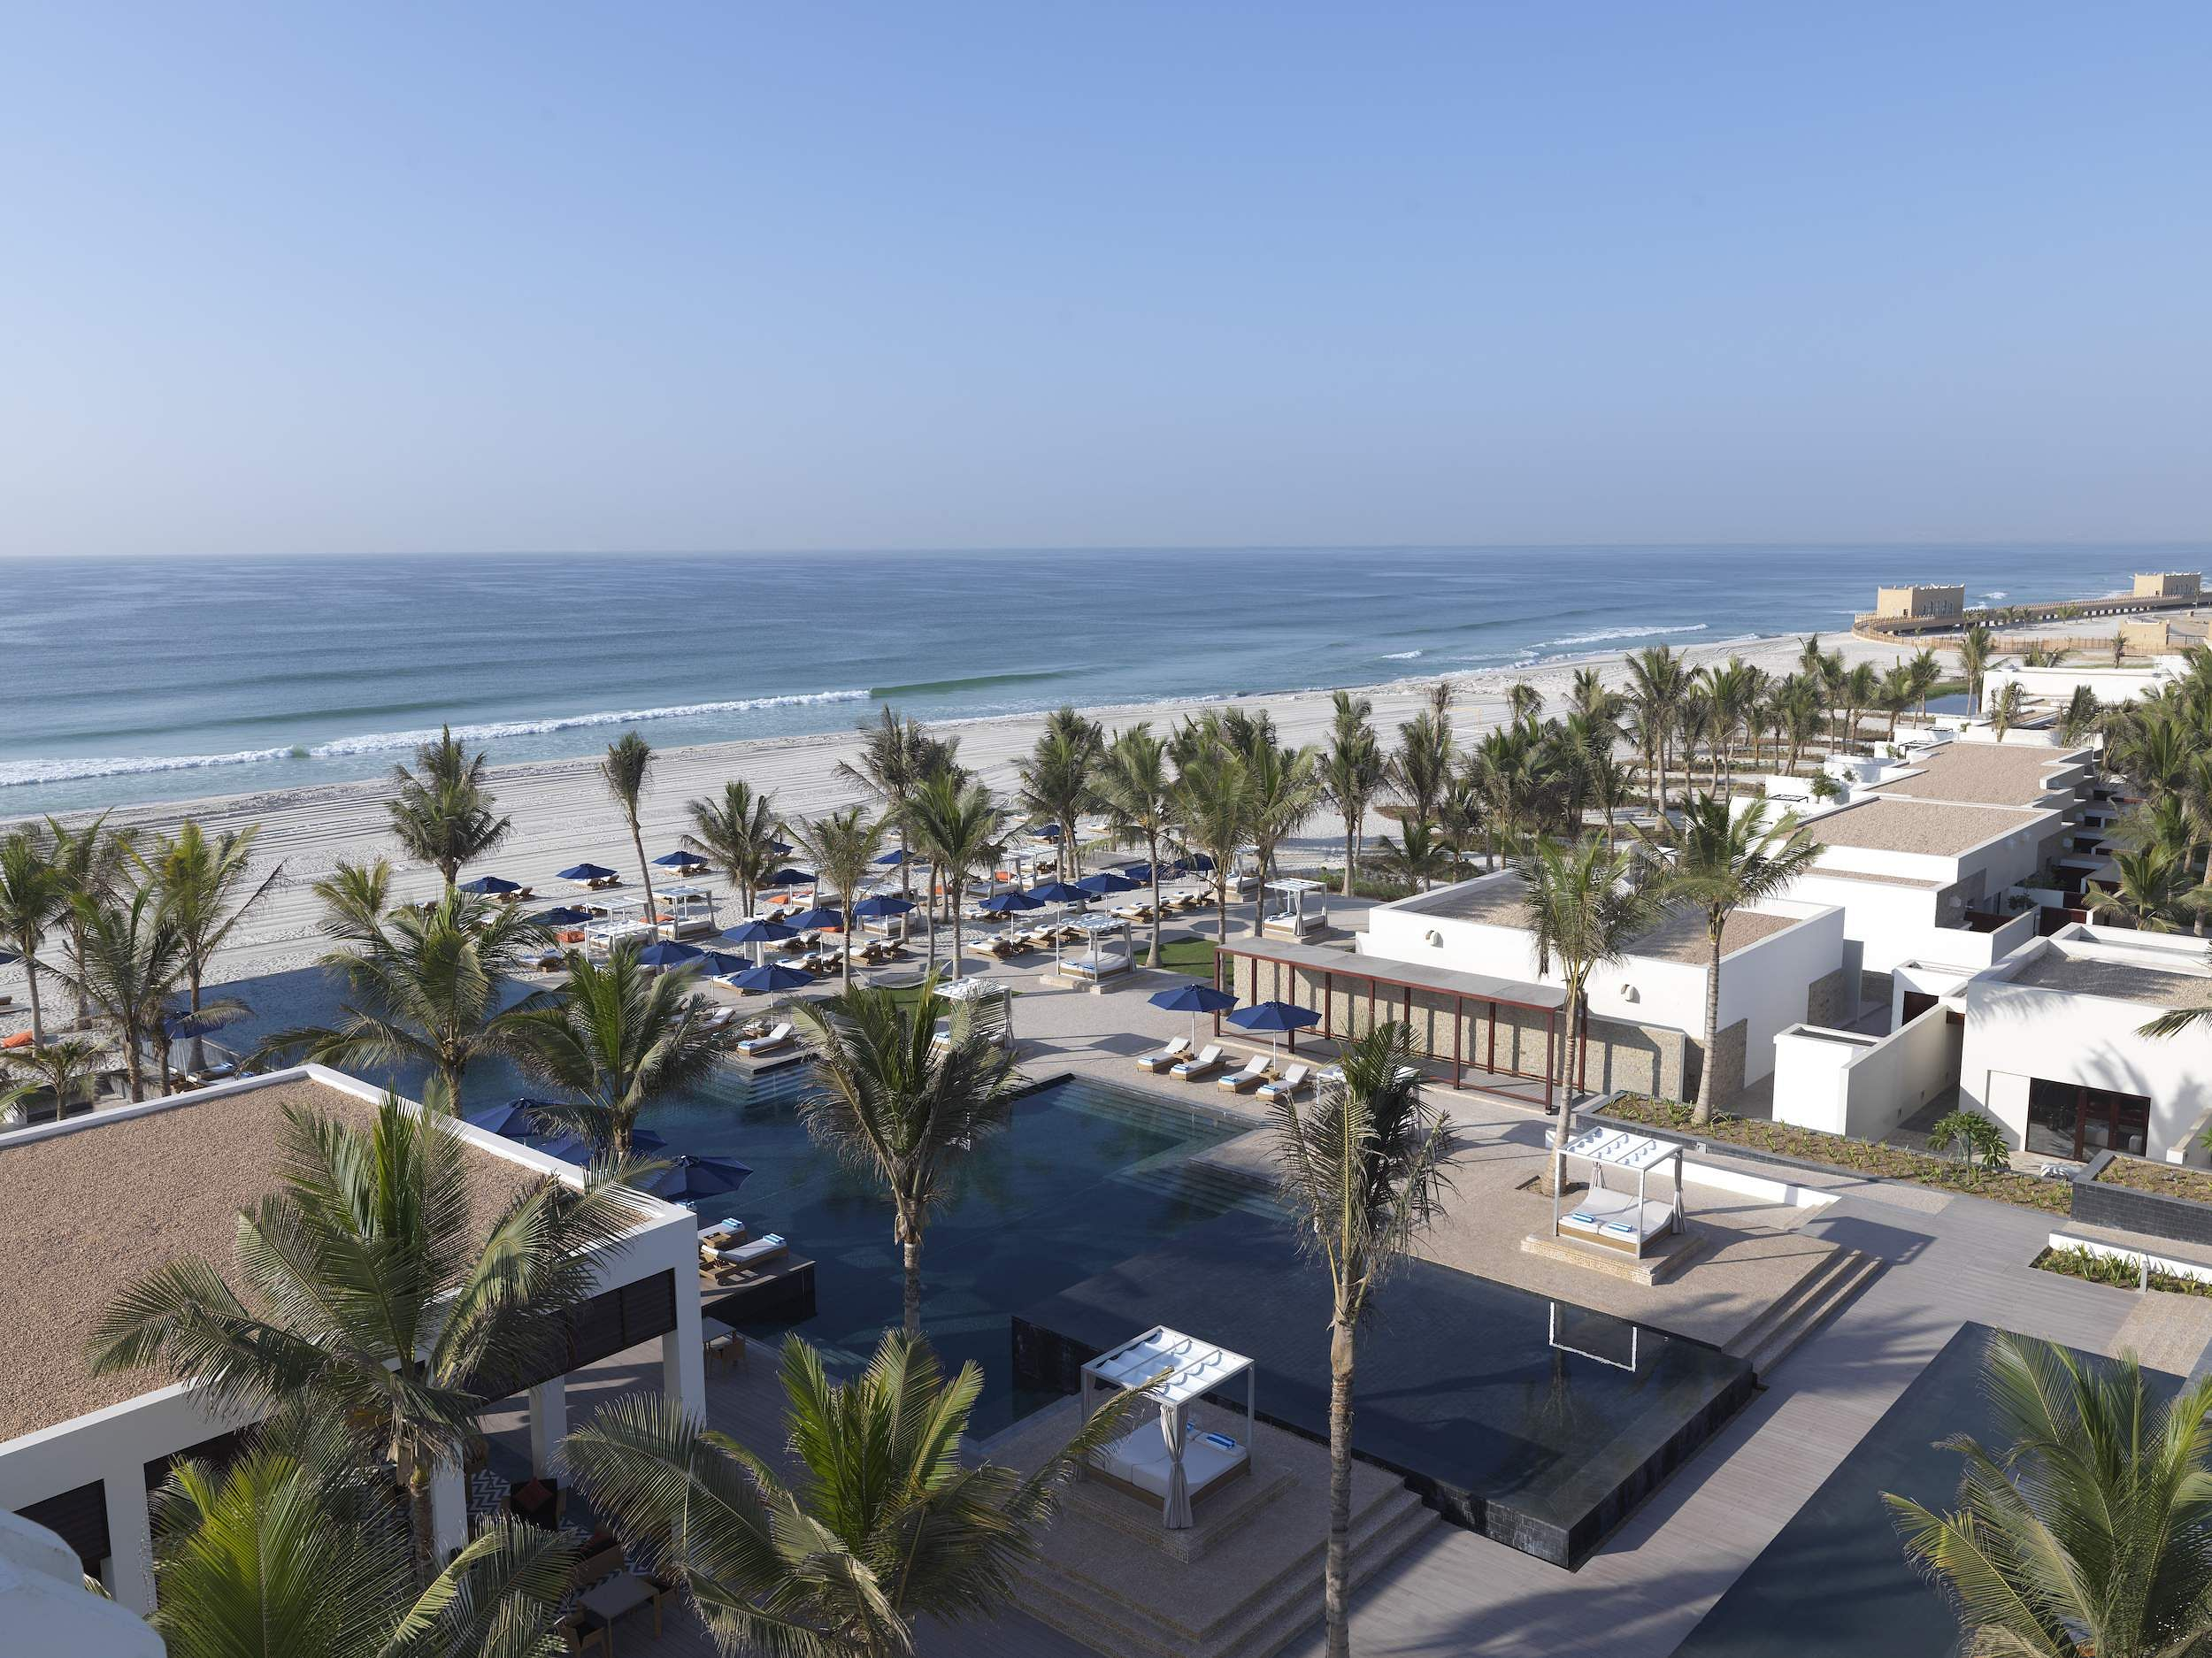 An overview of Al Baleed Resort